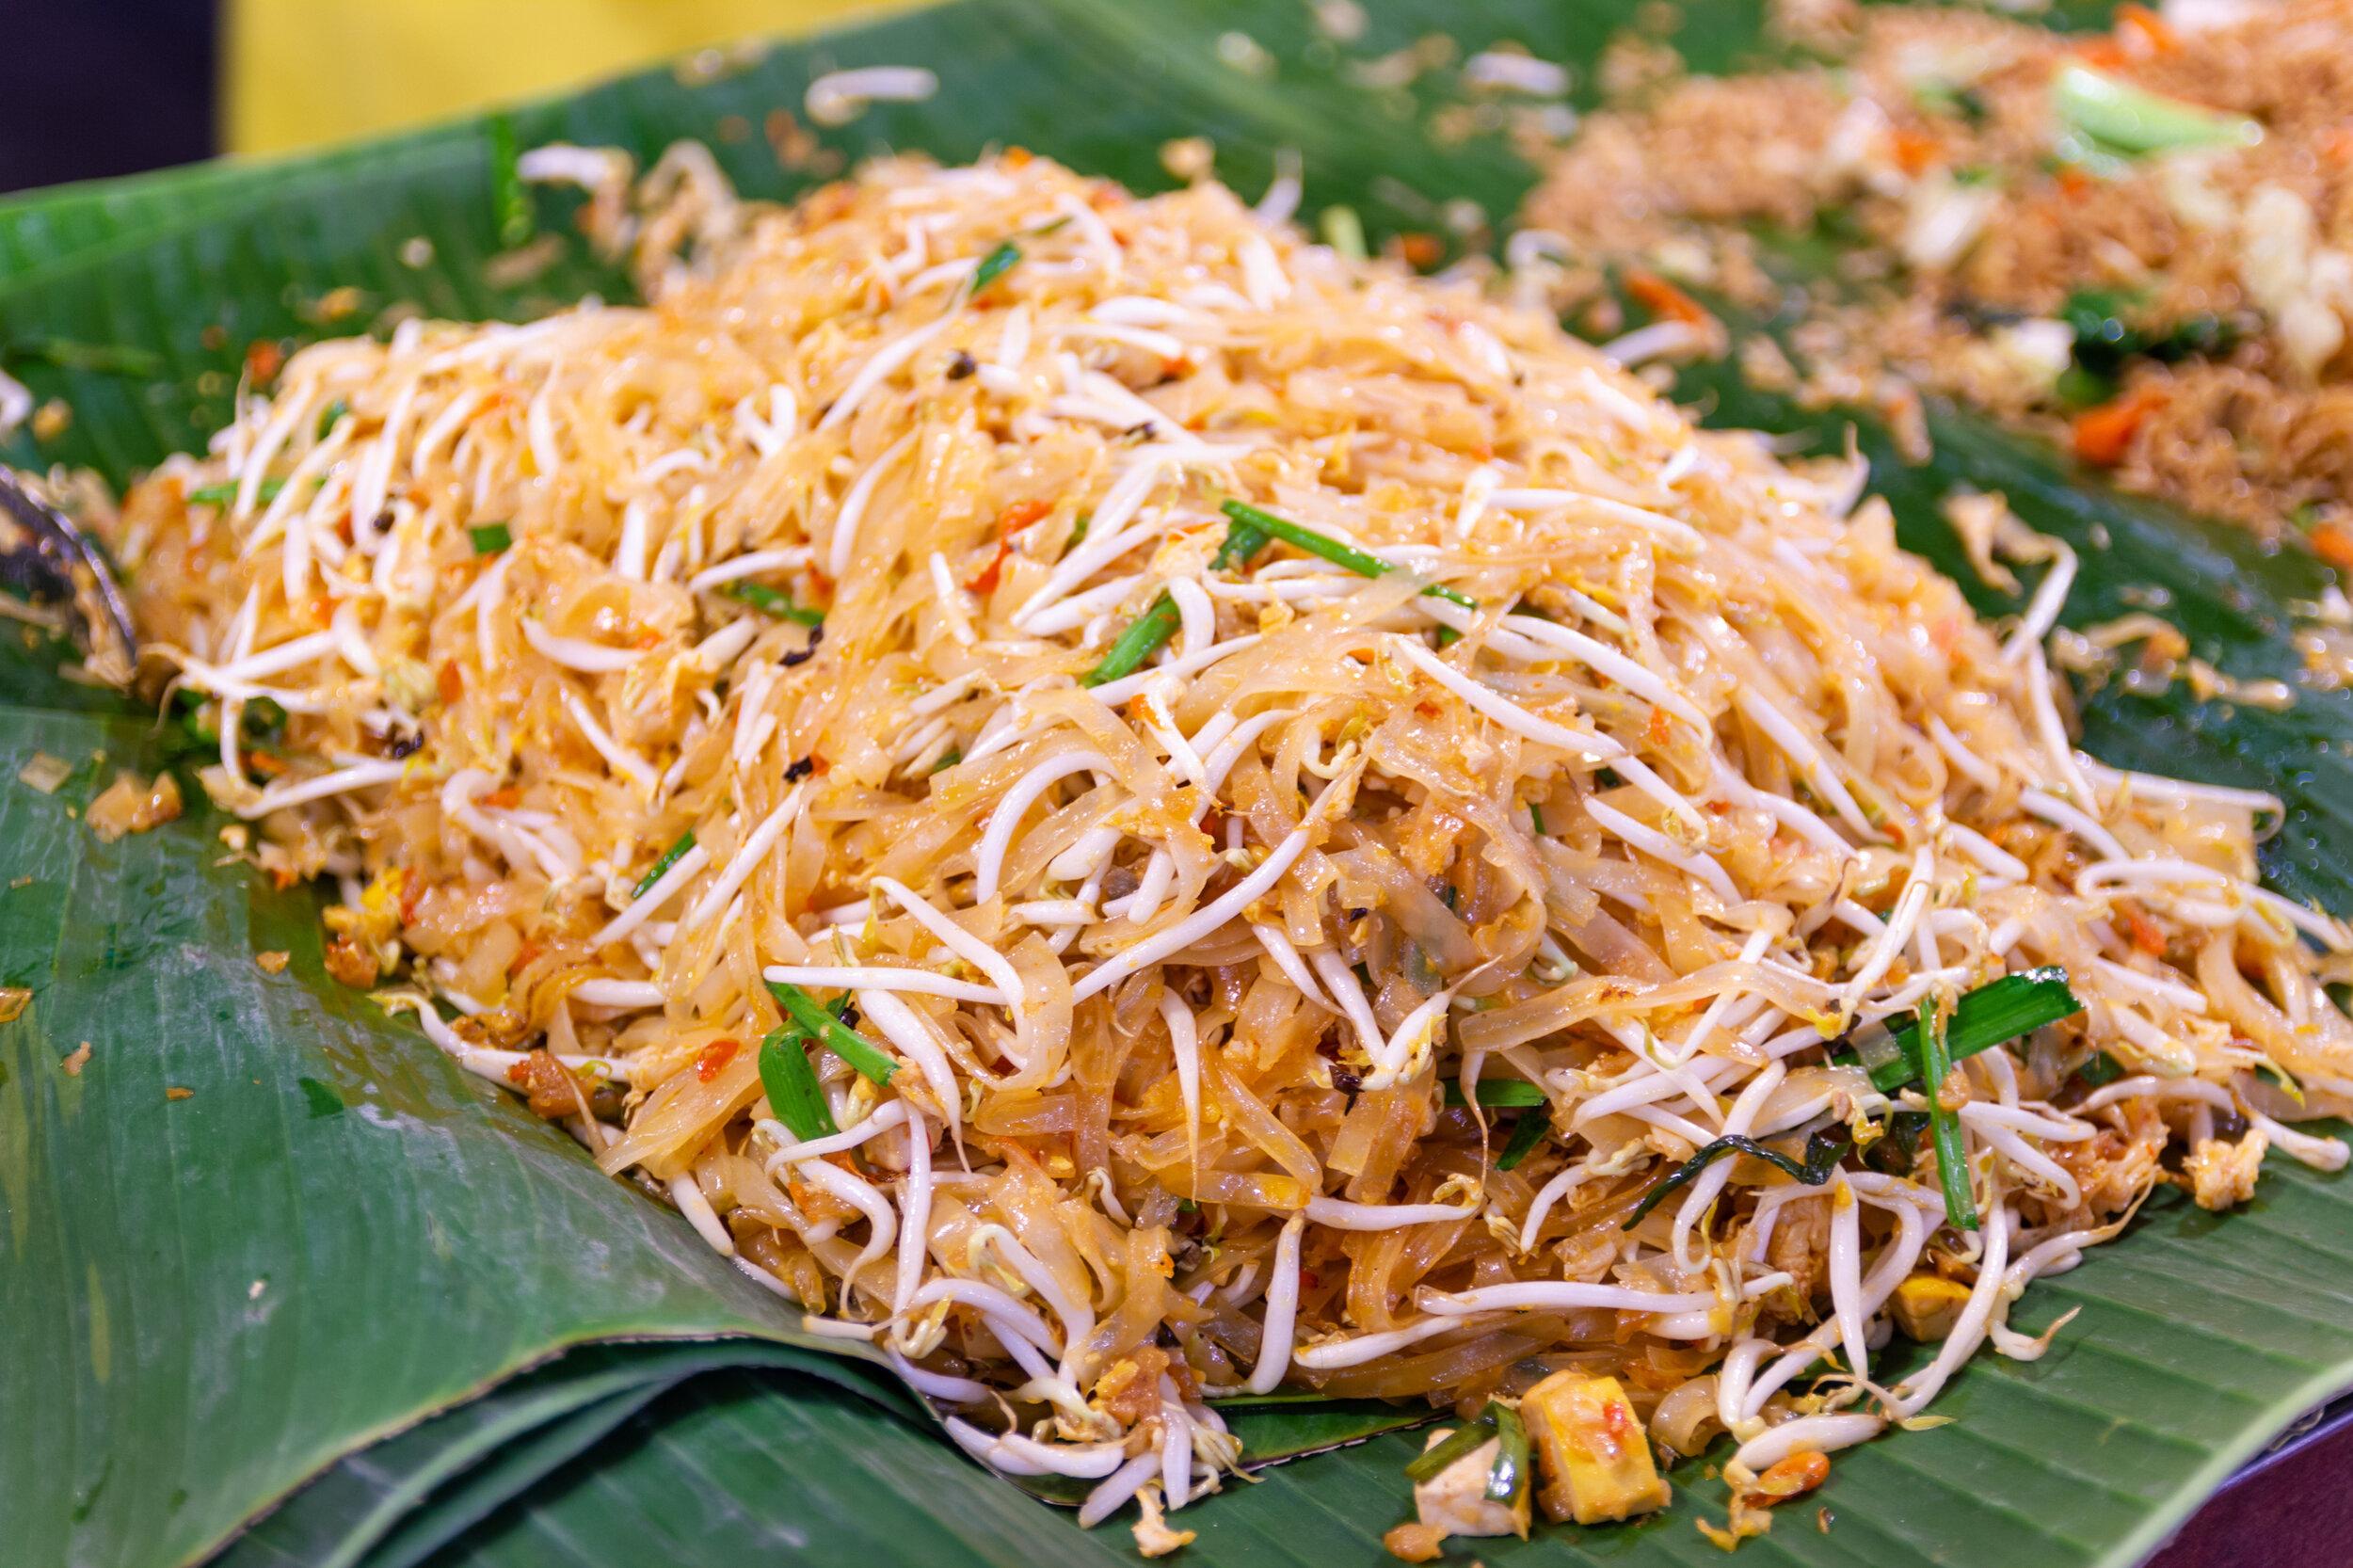 The most famous Thai street food, pad Thai.